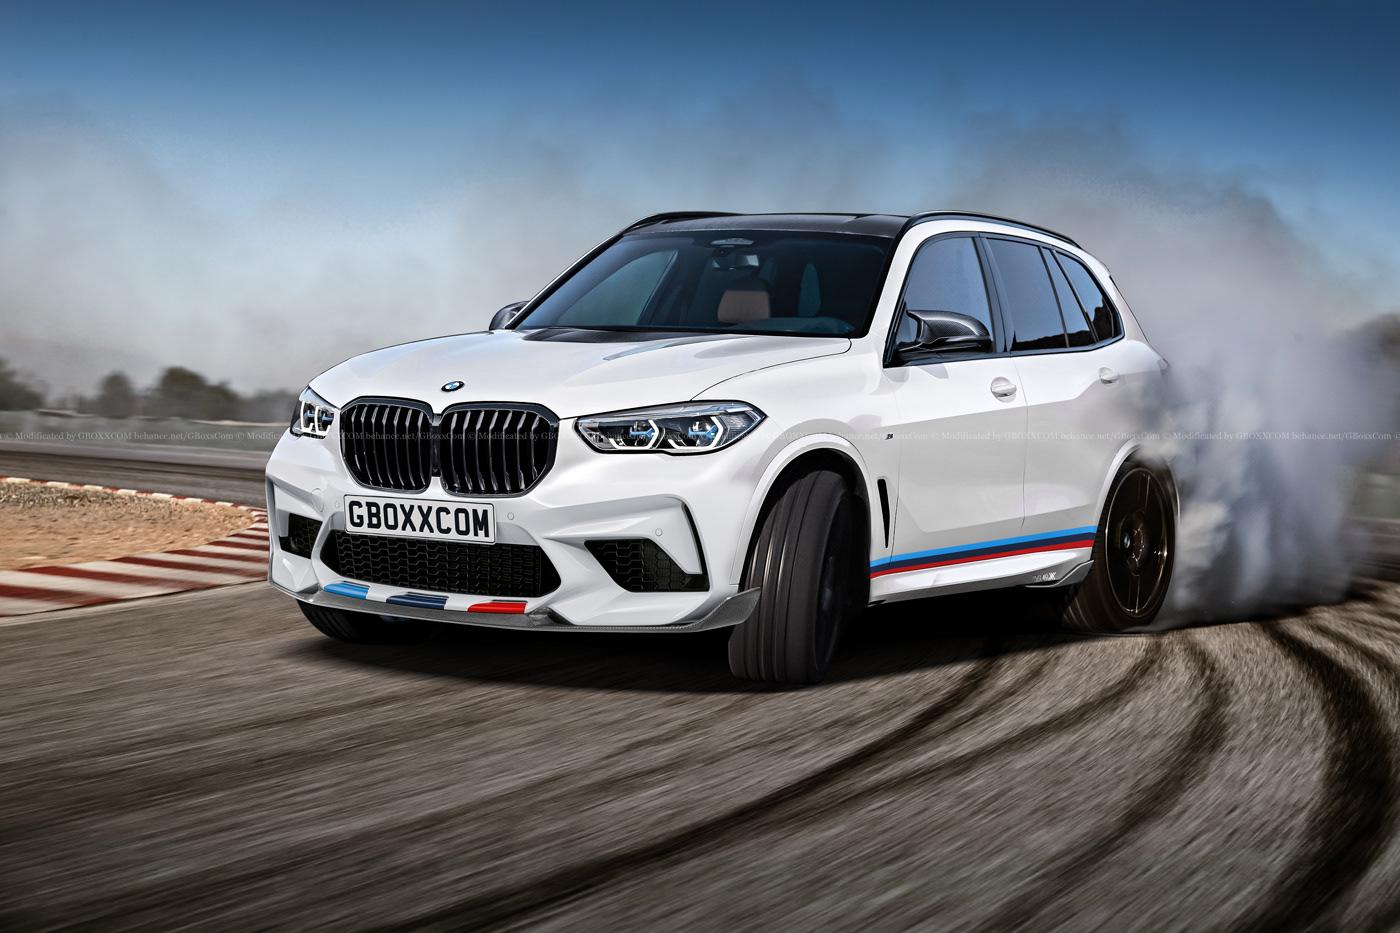 2019BMWX5M BMWX5M BMWX5MSport BMWX5MSportPackage BMWX5MSportsActivityVehicle BMWX5MRacecar BMWX5MRacing BMWX5MDrift BMWDriftSUV